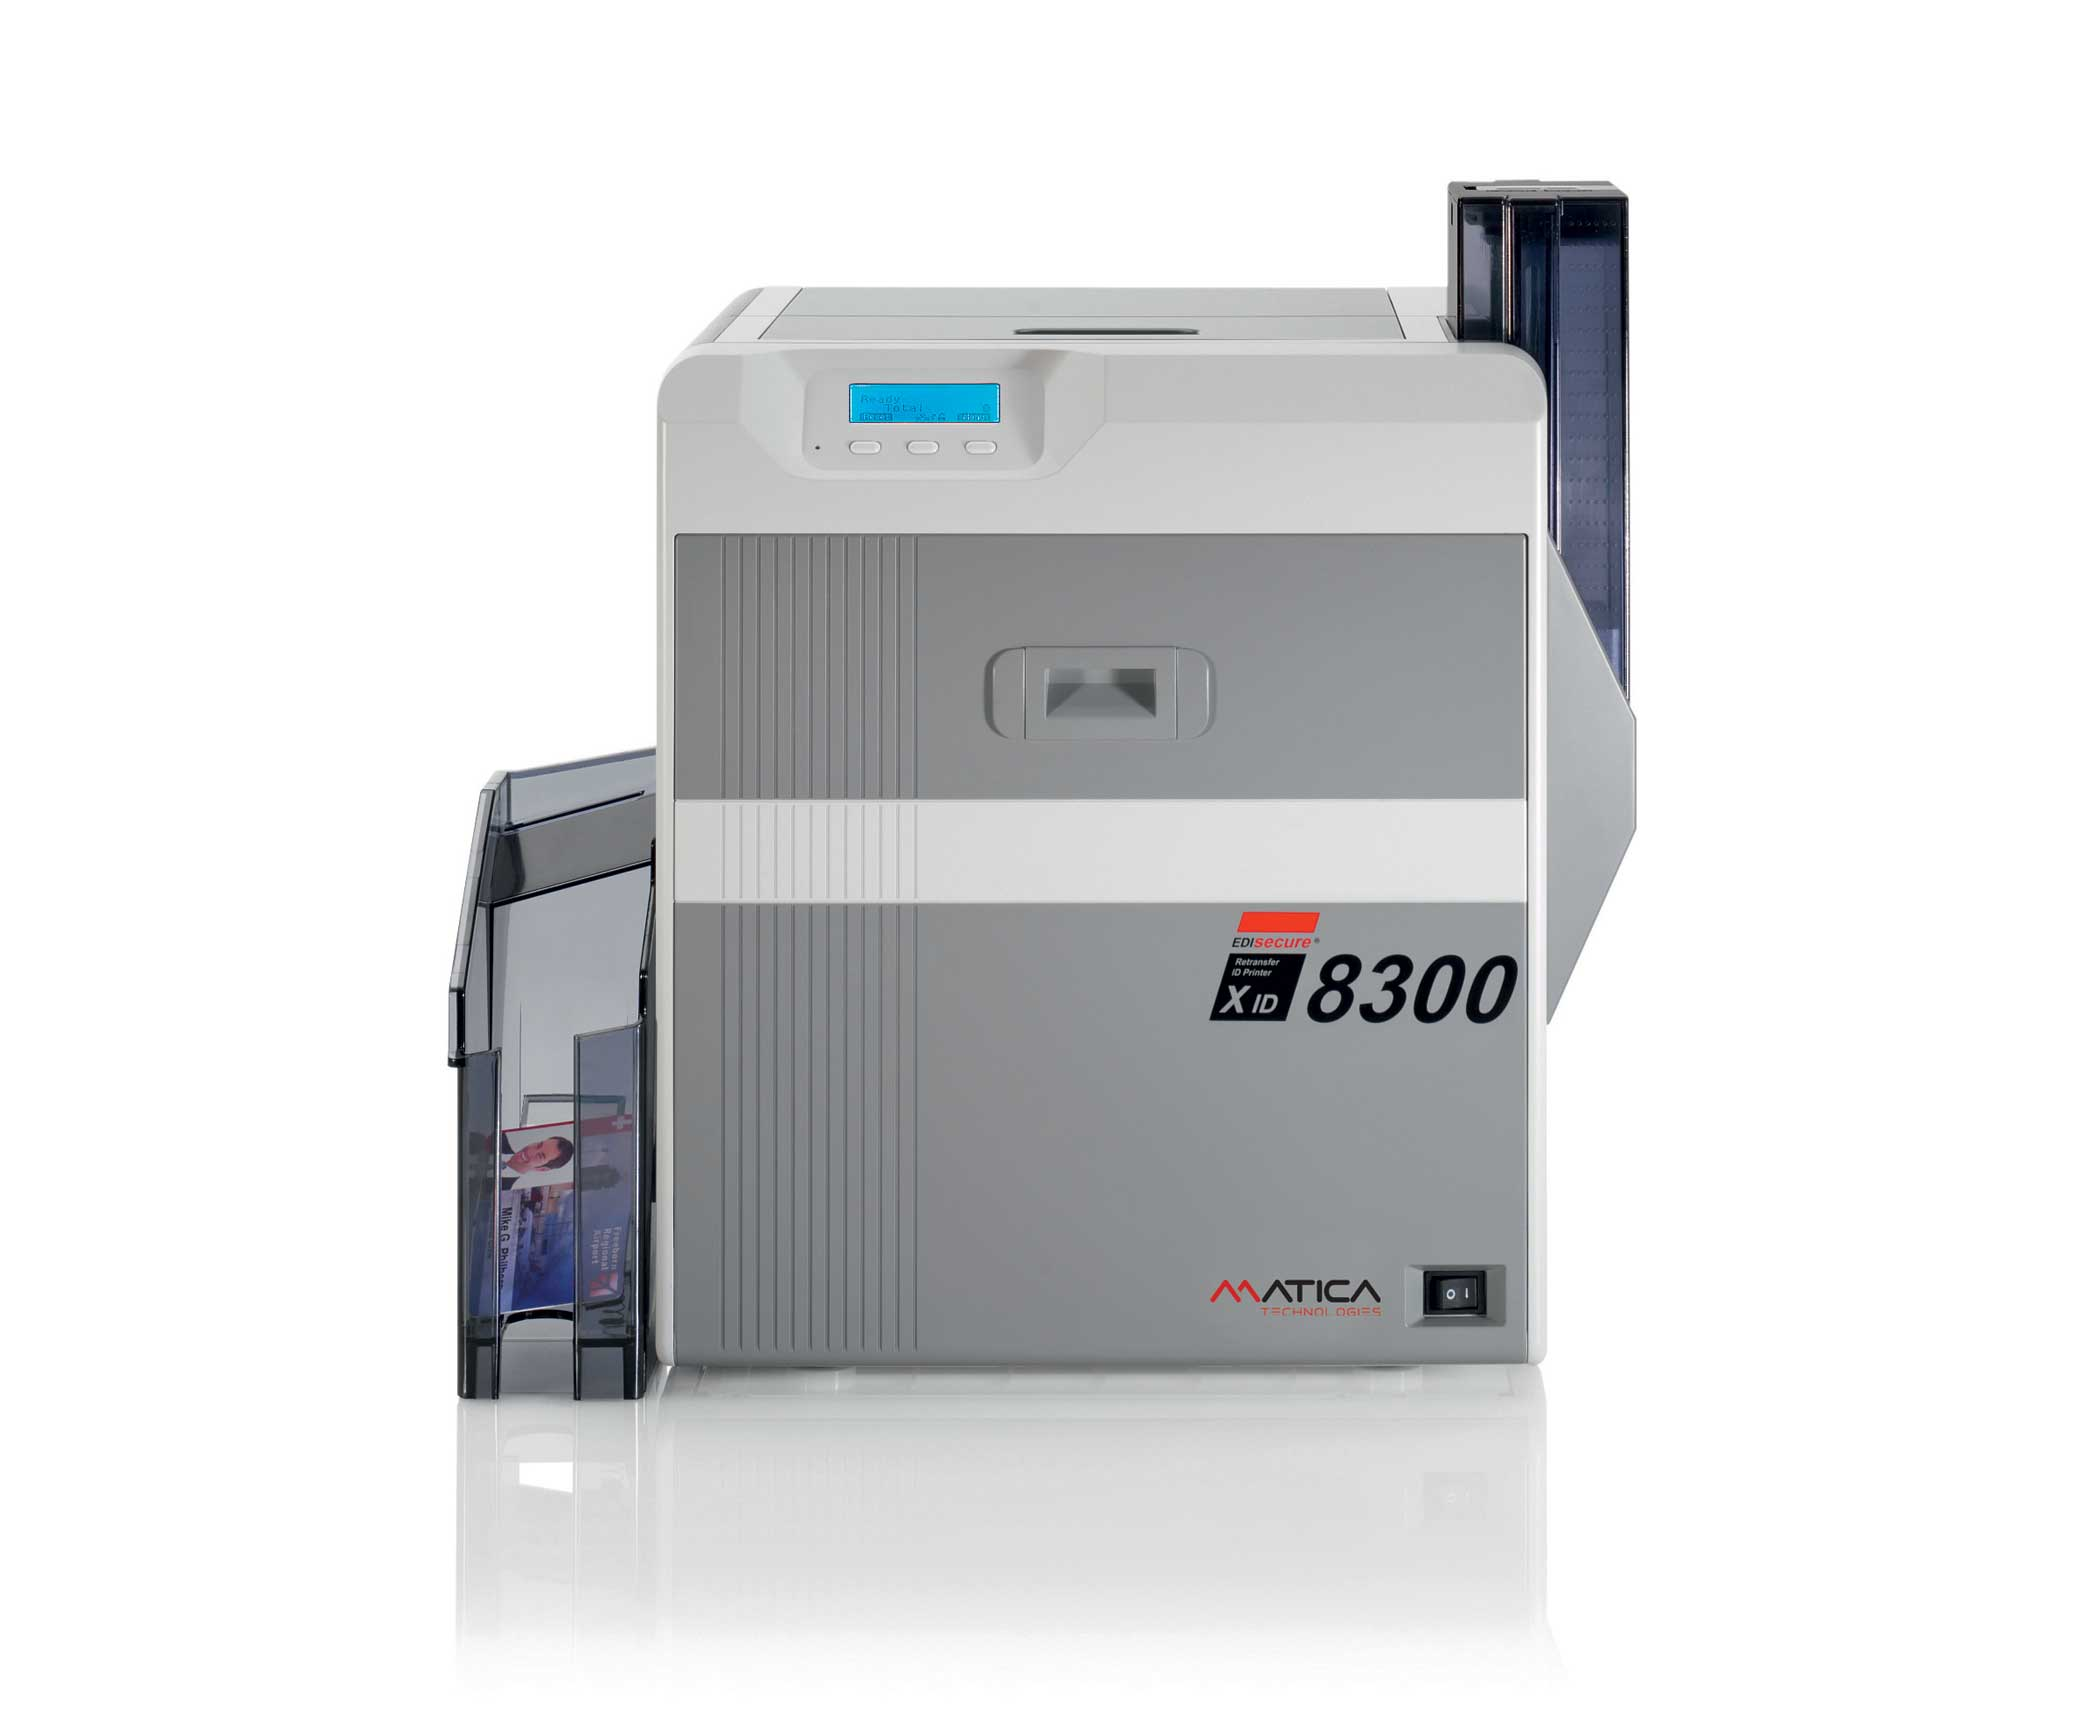 matica xid8300 retransfer id card printer - Id Card Printer